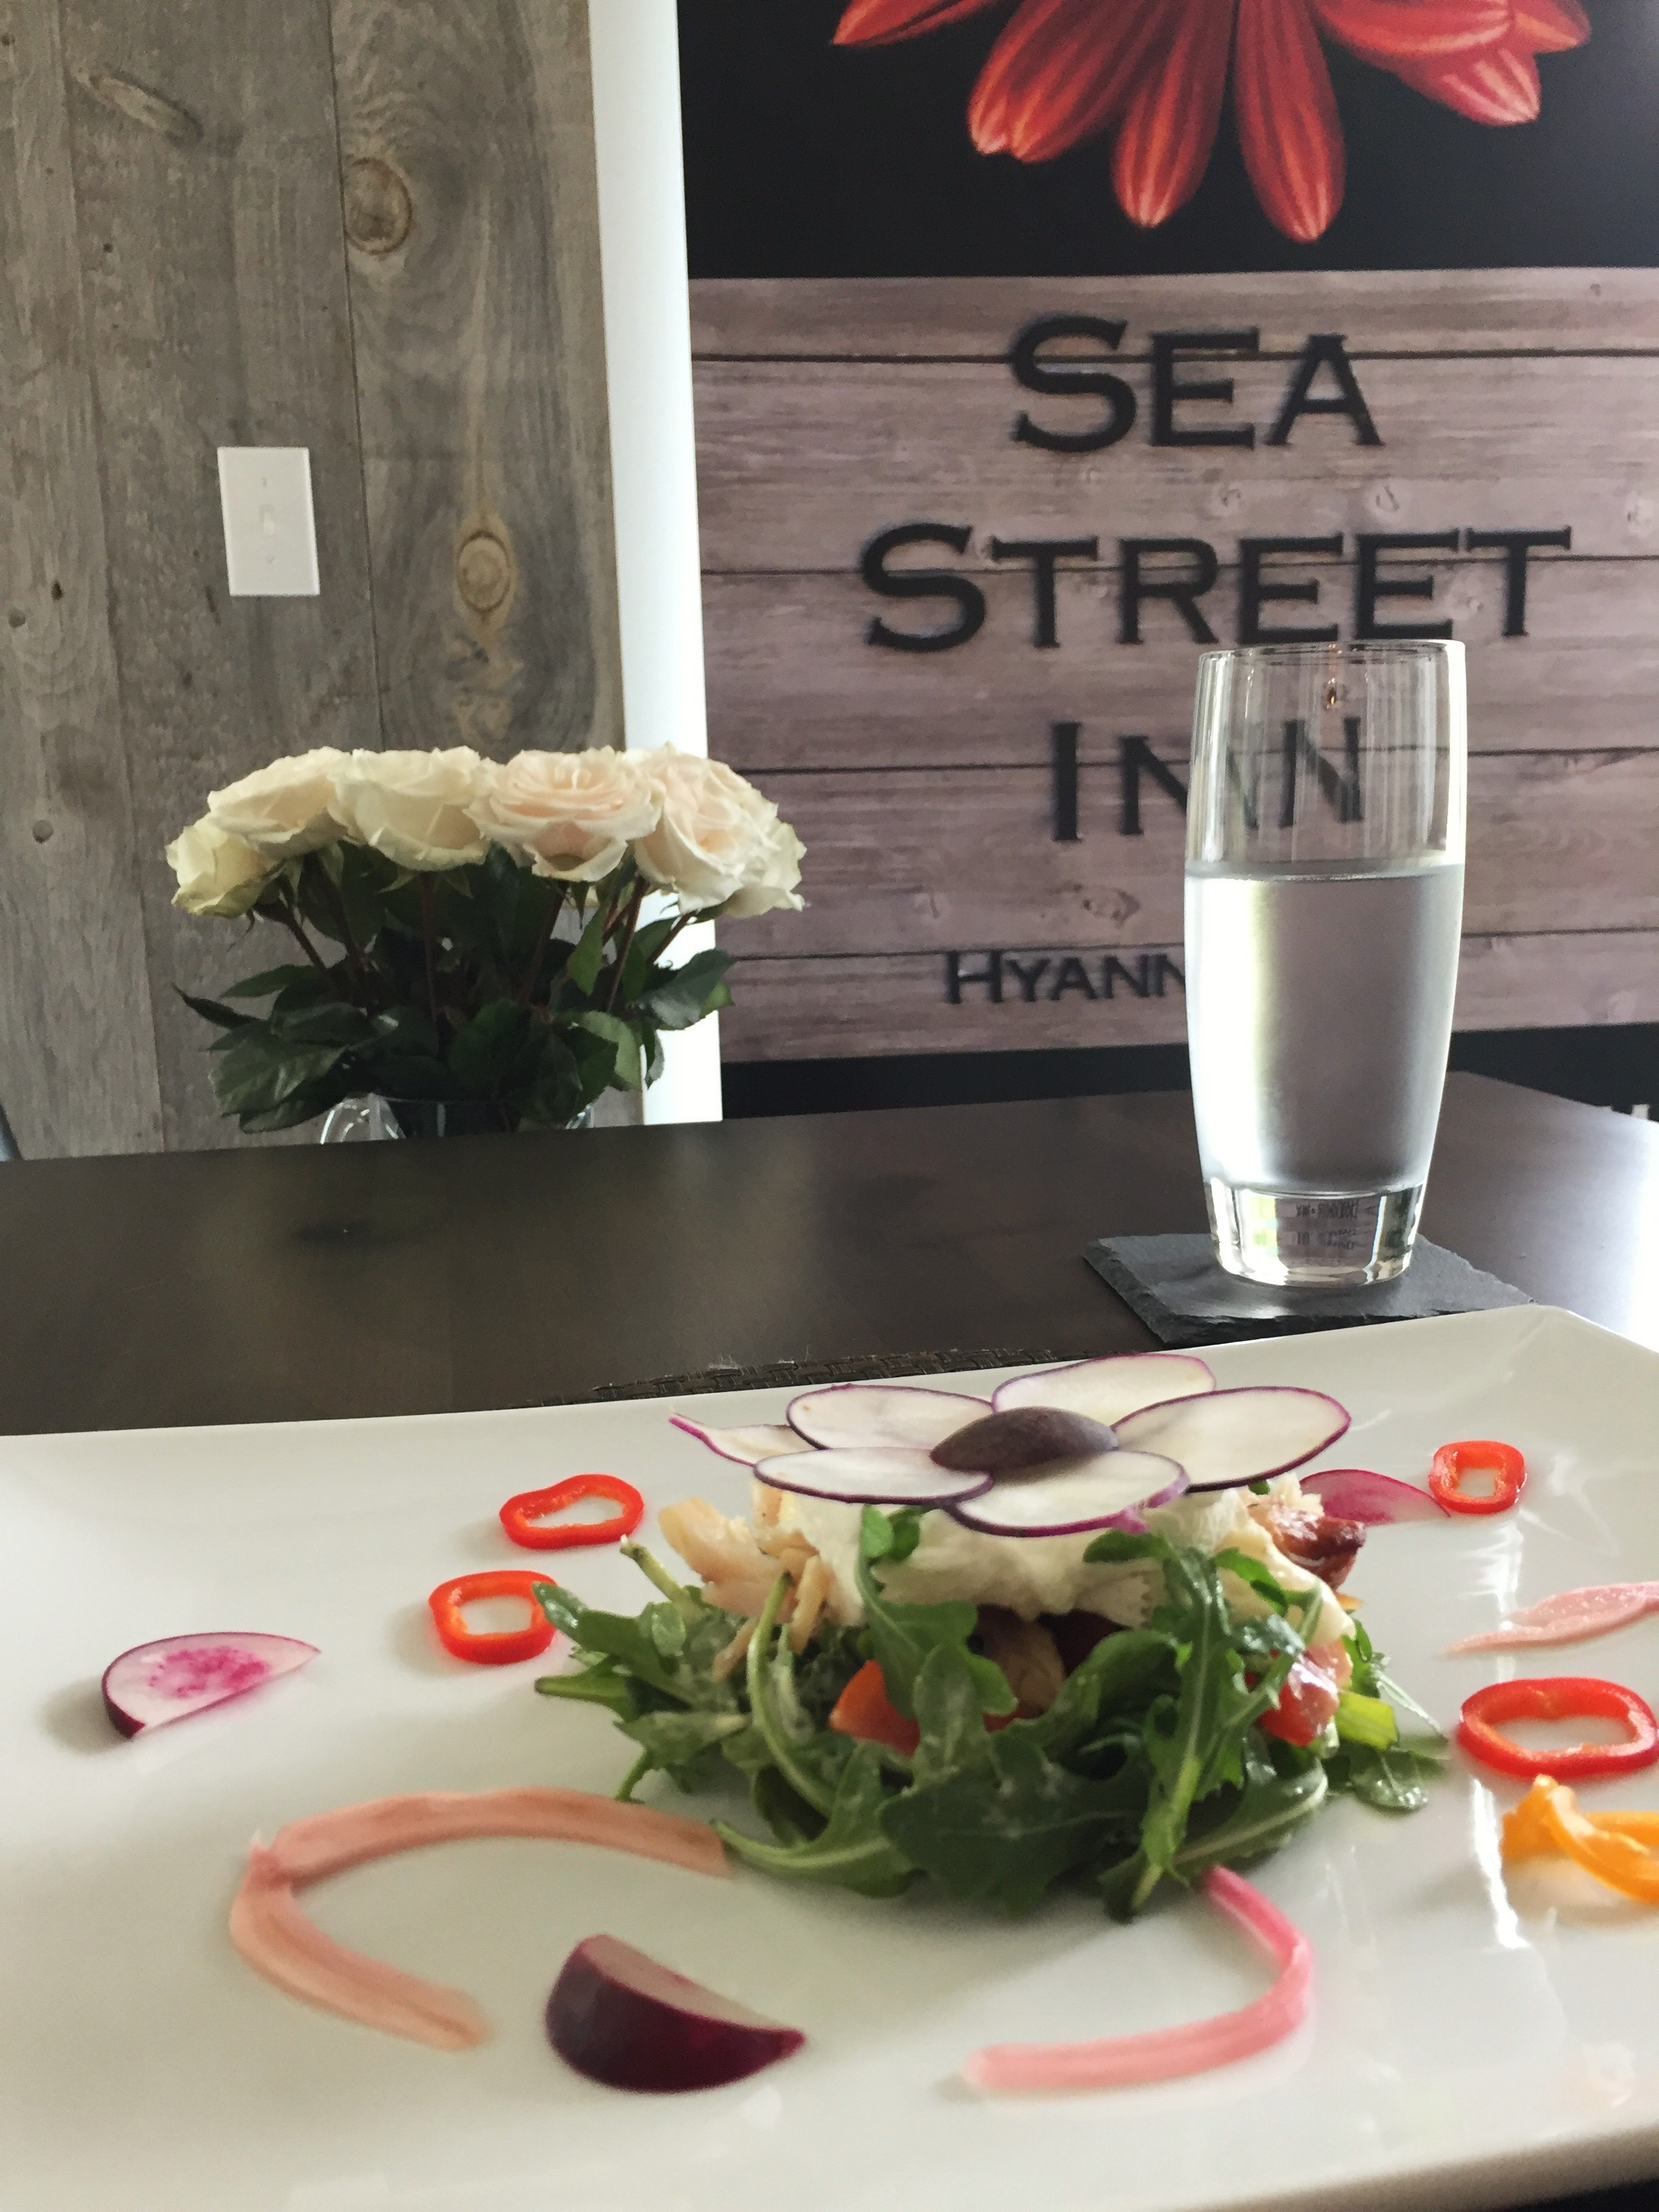 Sea Street Inn - Menu Item 2 - Xenia D'Ambrosi